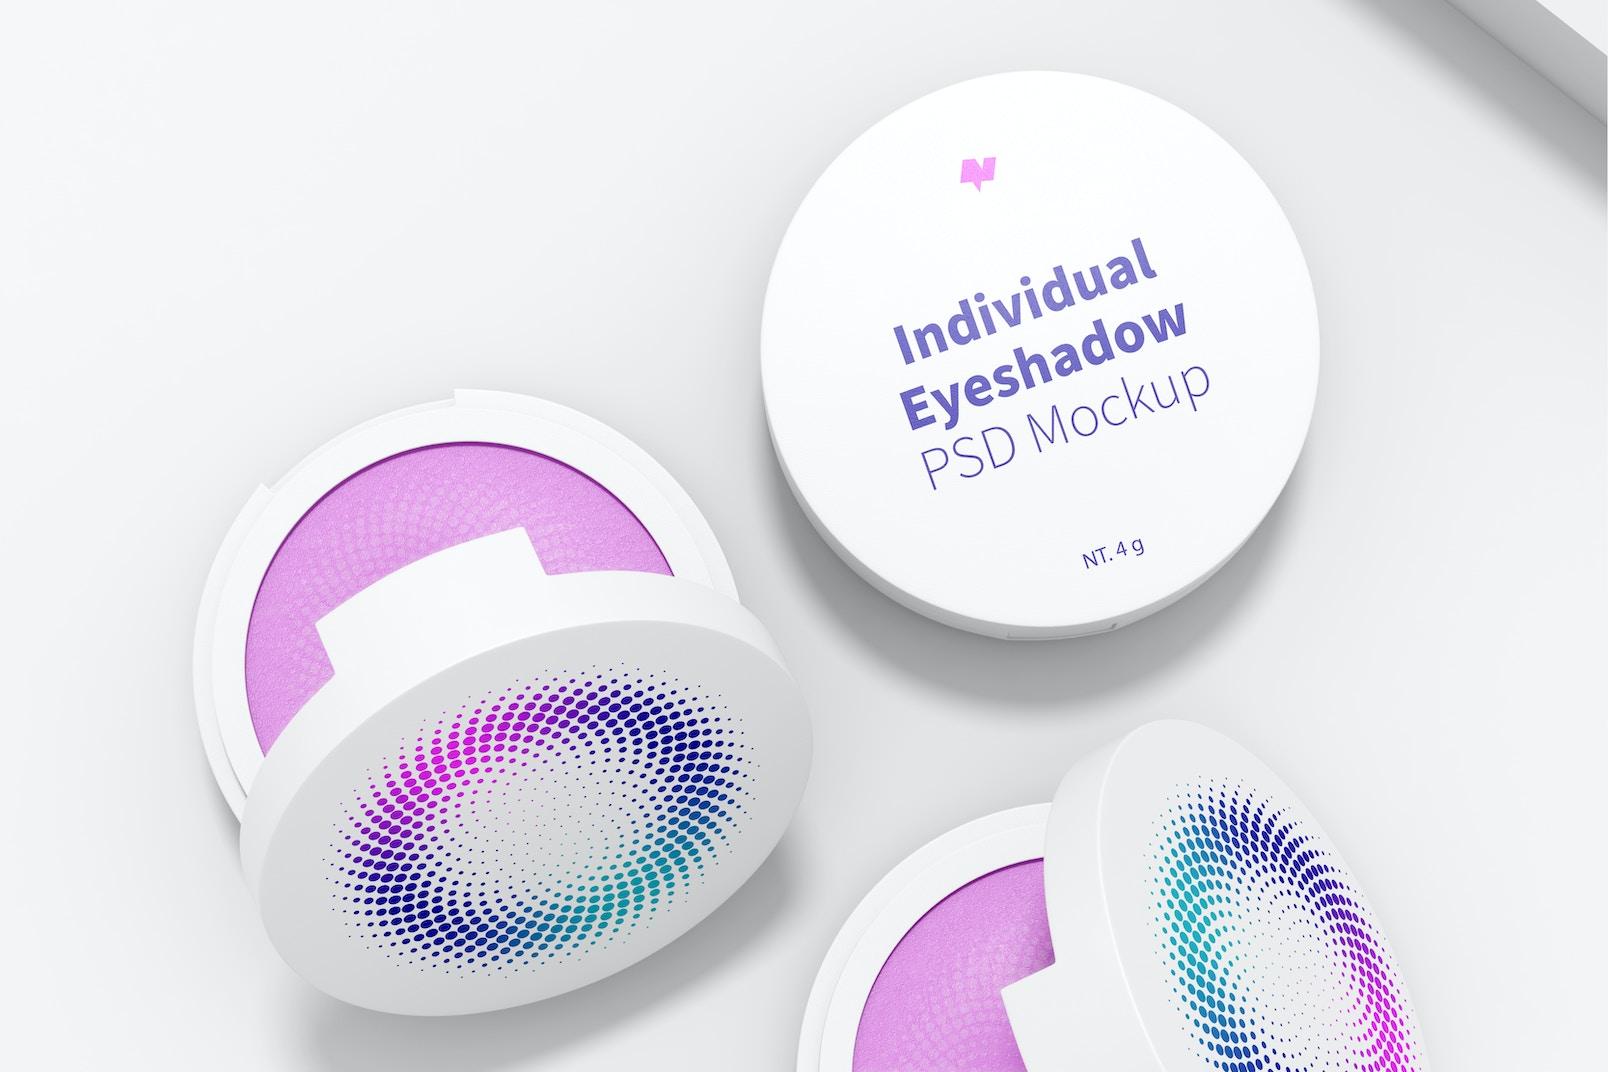 Round Individual Eyeshadows Mockup, Top View